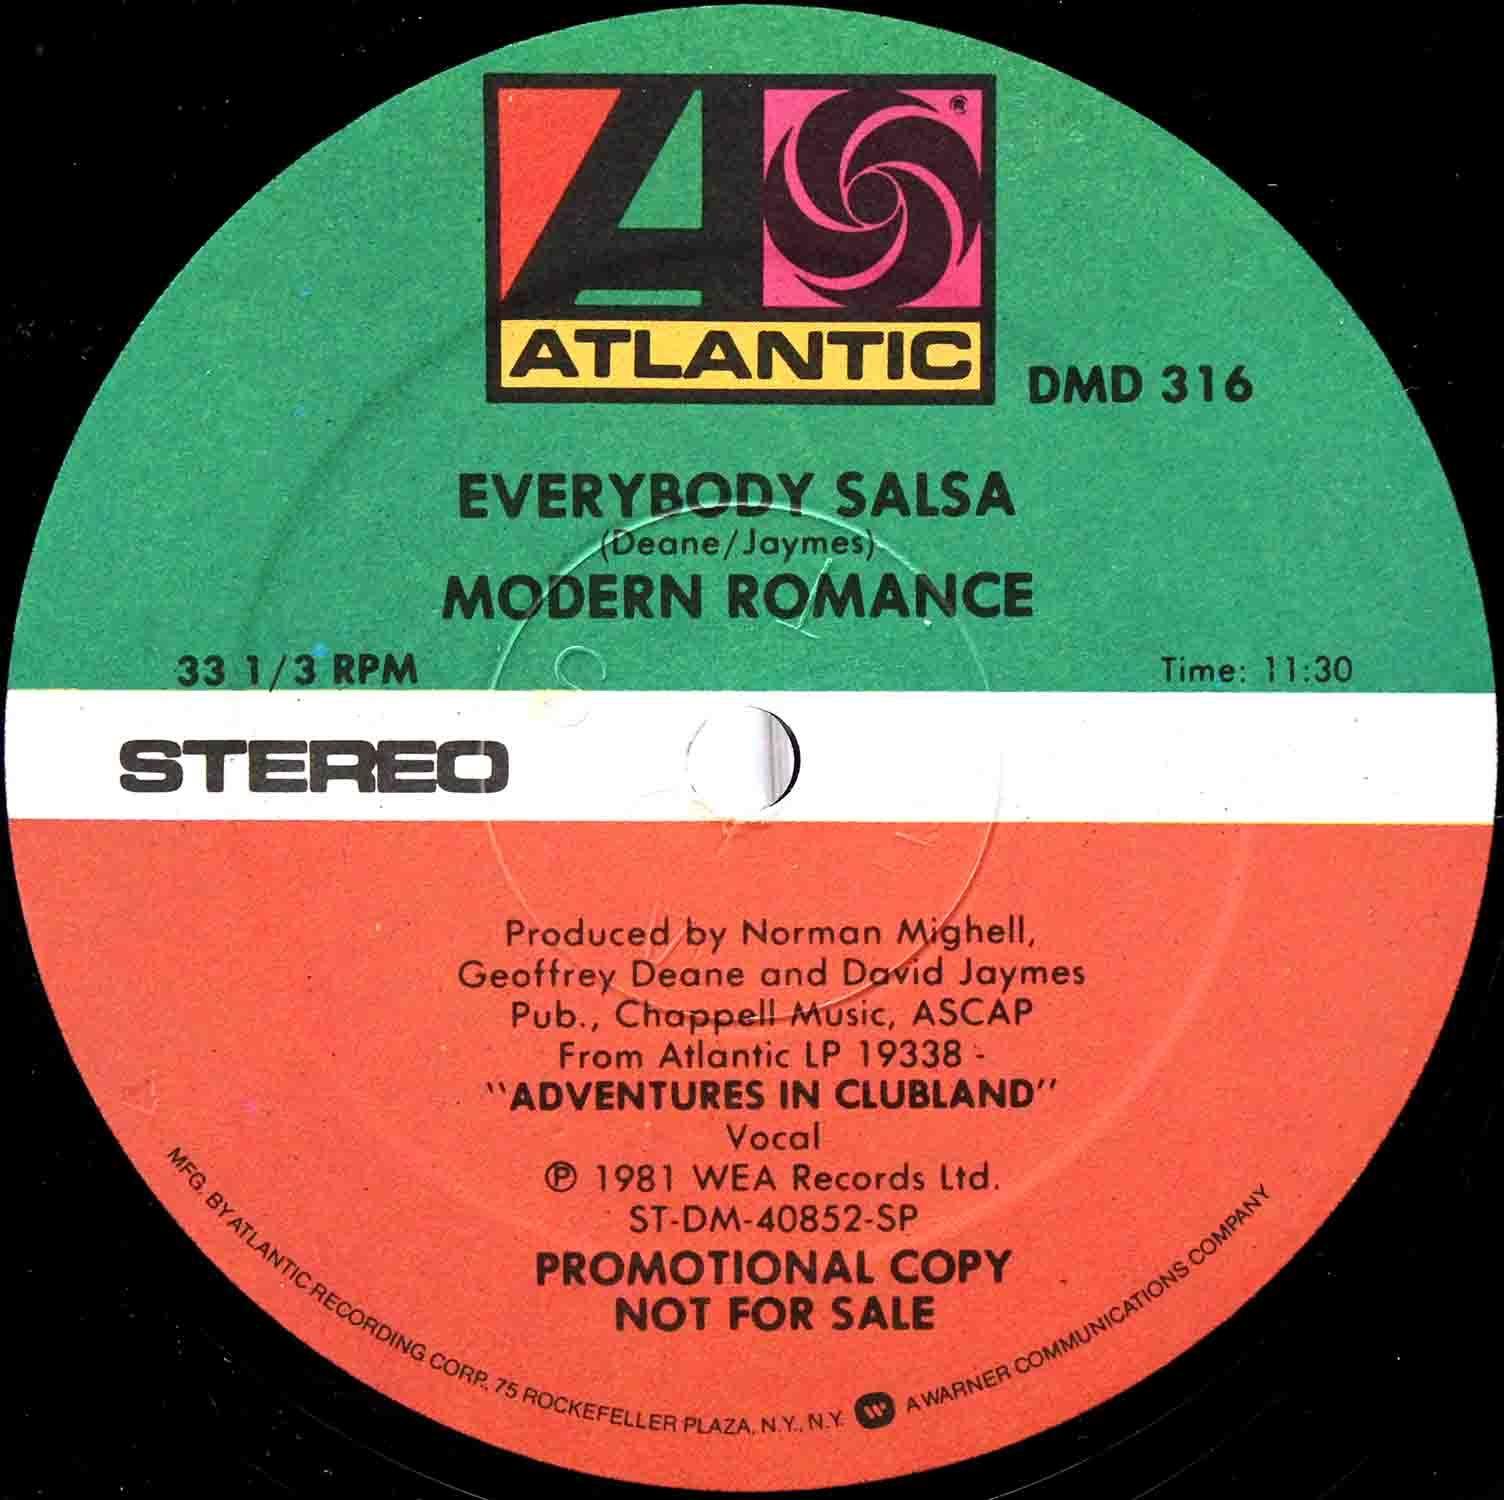 Modern Romance - Everybody Salsa 03